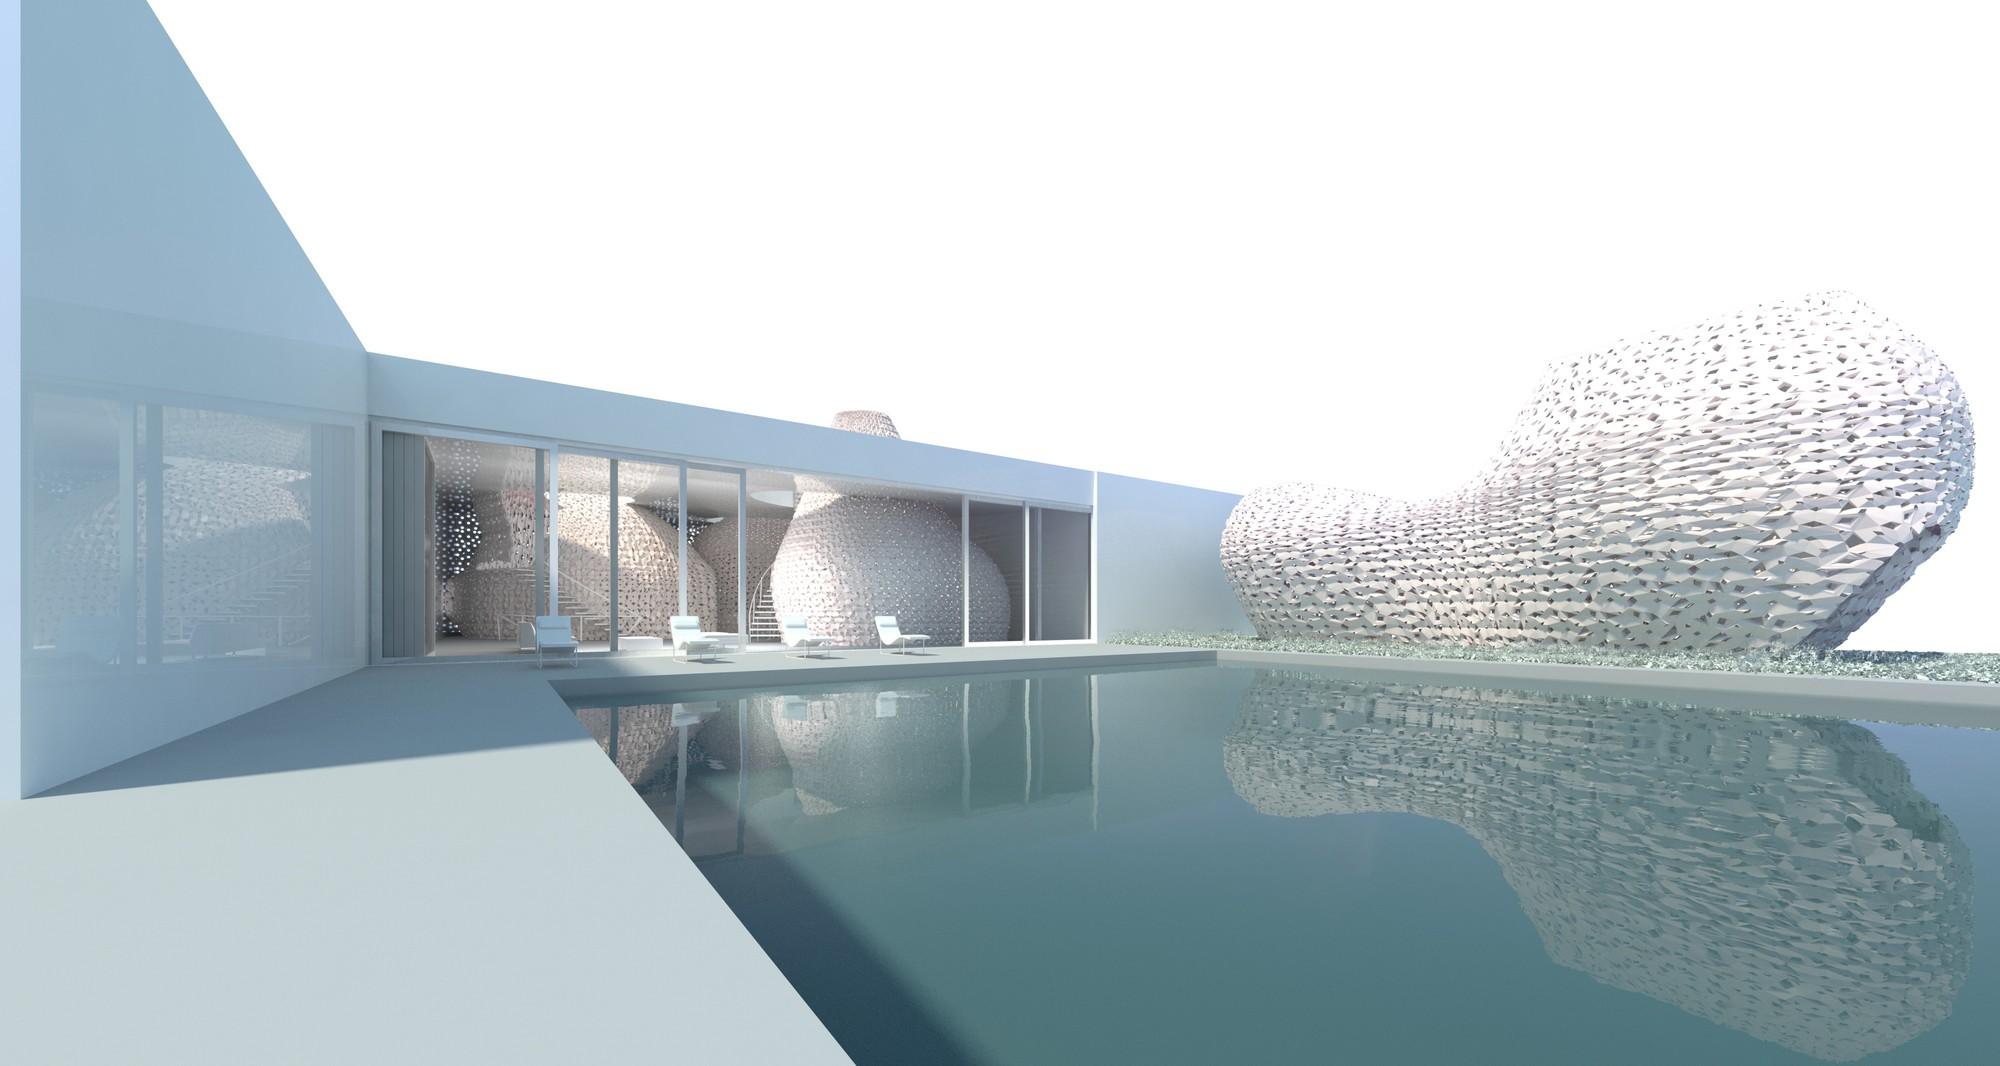 Piscina y cabaña impresa en 3D. Imagen © Emerging Objects